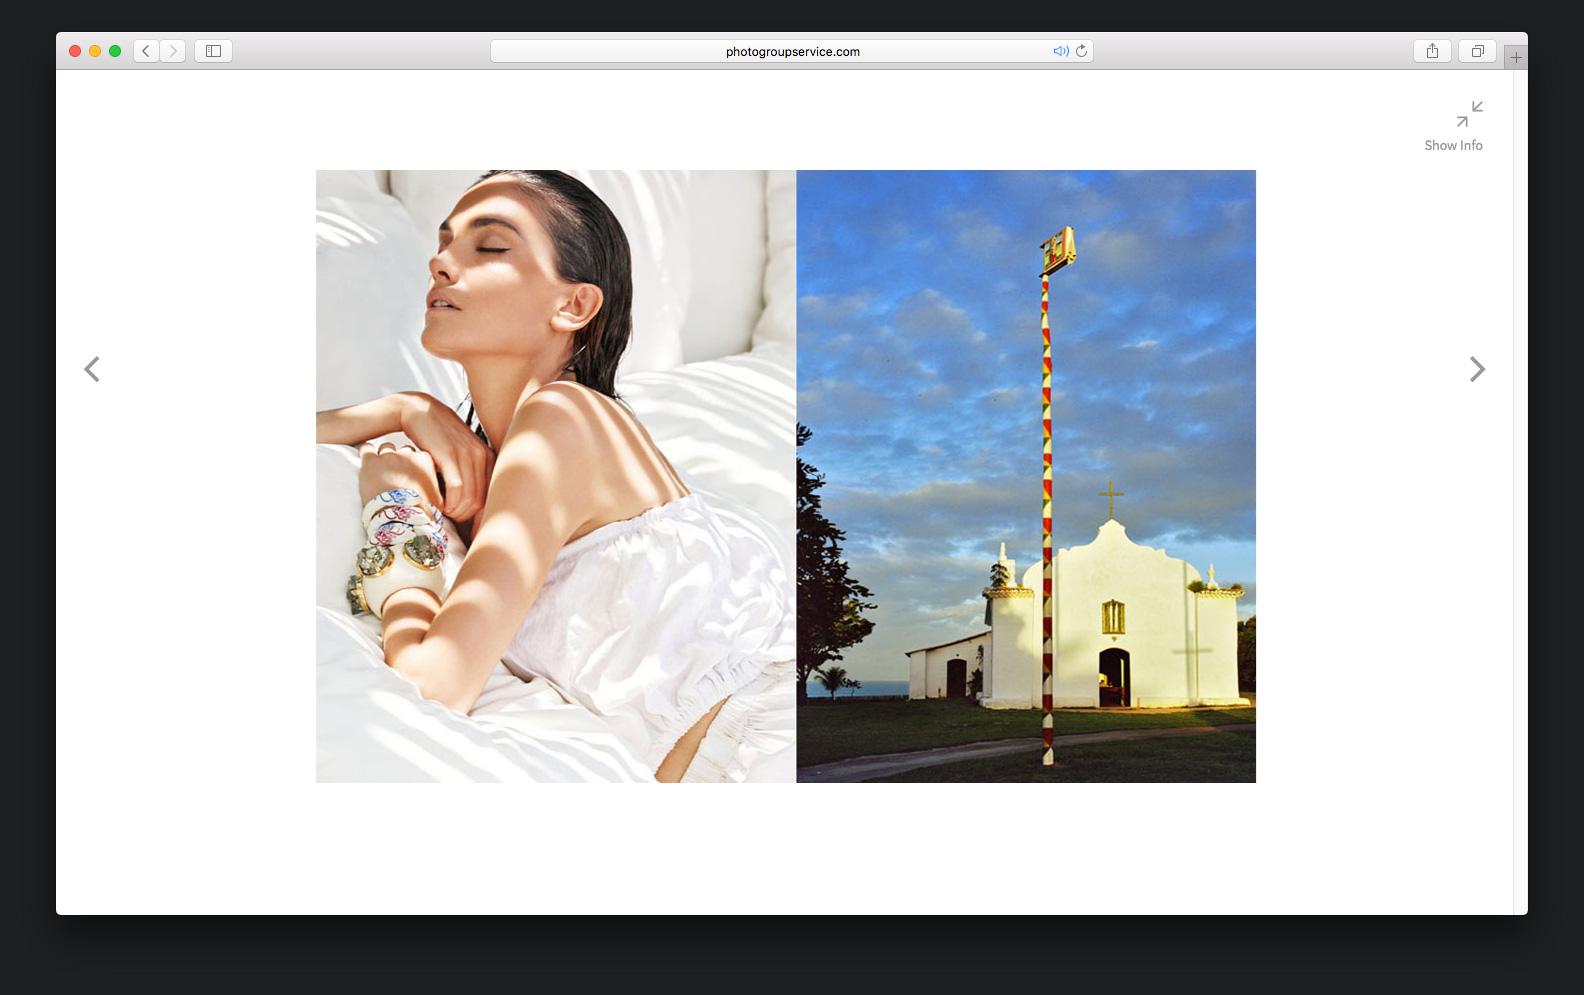 photogroupservice_com_9.jpg